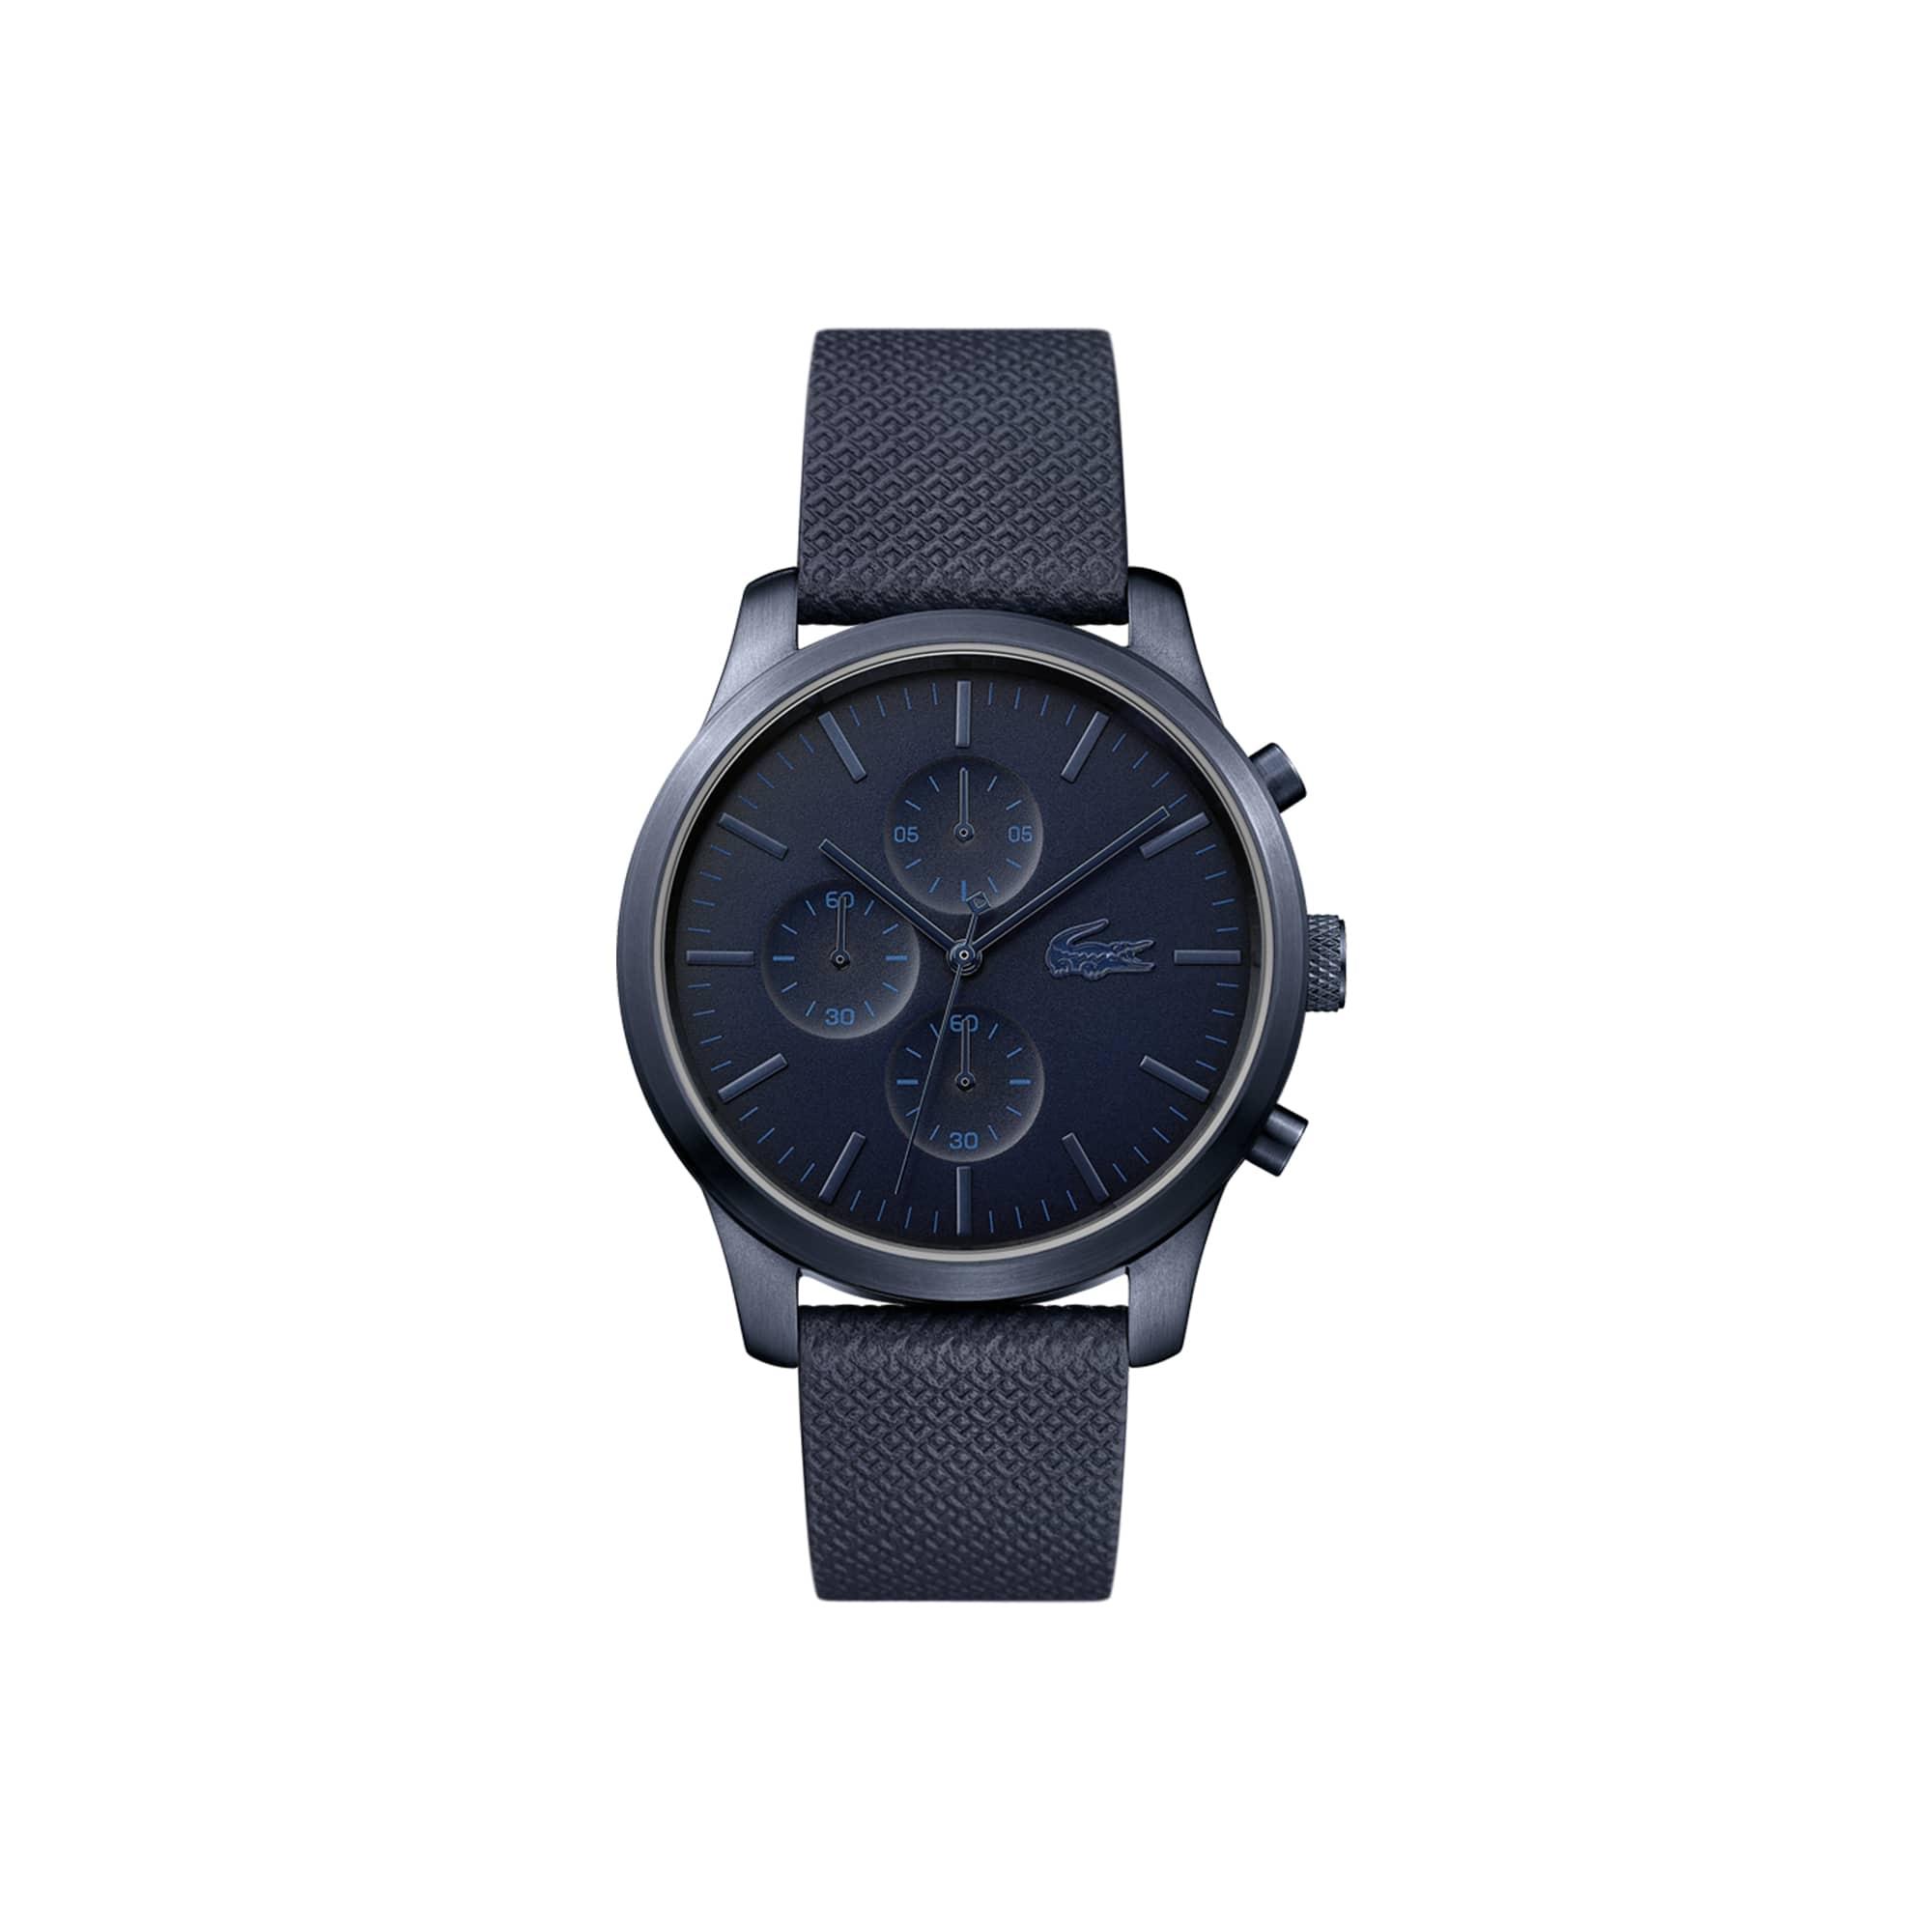 Orologio Lacoste.12.12 con cronografo 85° anniversario. Cinturino in pelle blu con goffratura Petit Piqué